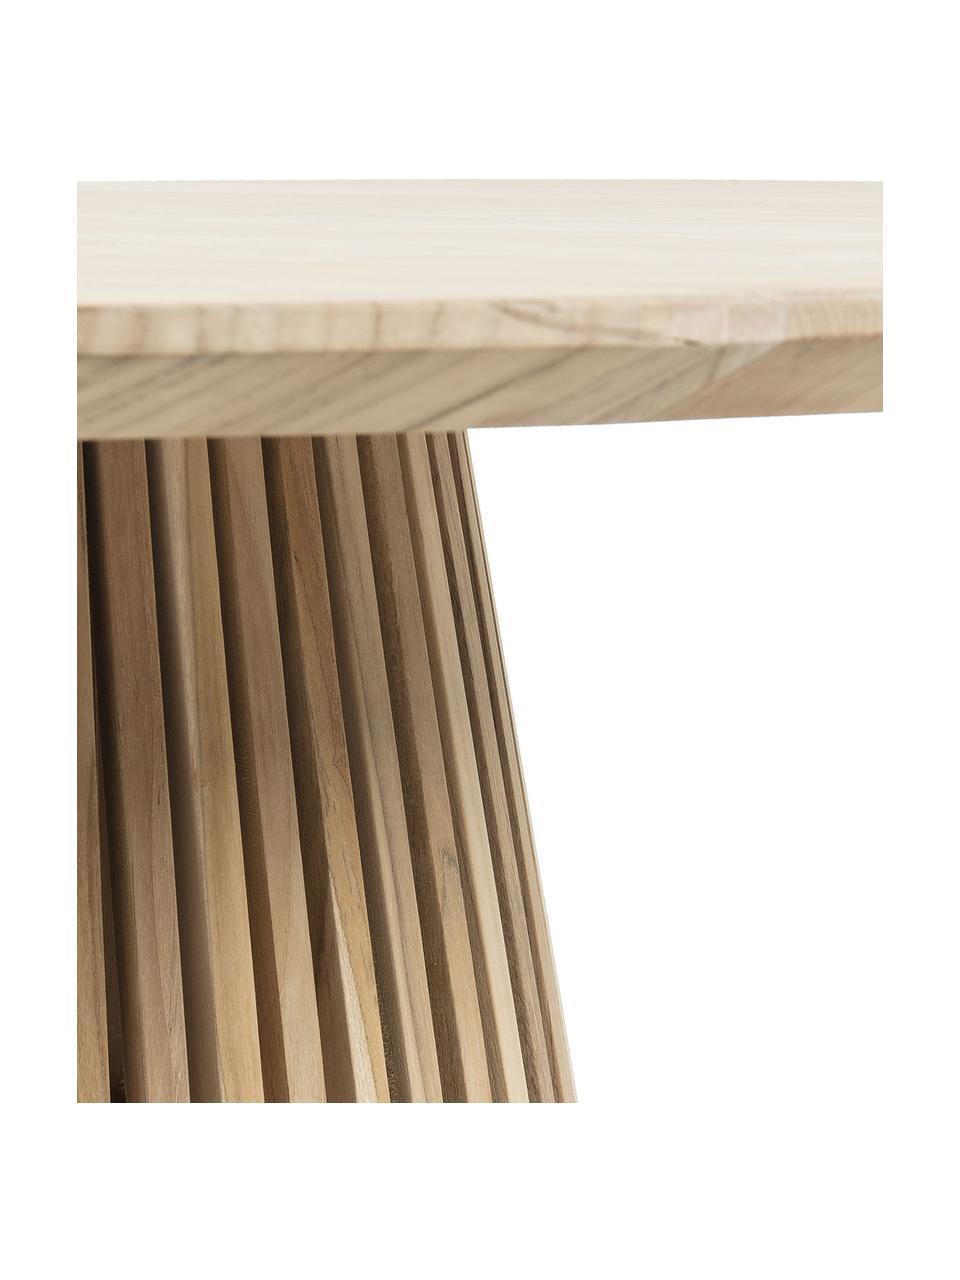 Runder Esstisch Jeanette mit Massivholzplatte, Ø 120 cm, Teakholz, naturbelassen, Teakholz, Ø 120 x H 78 cm